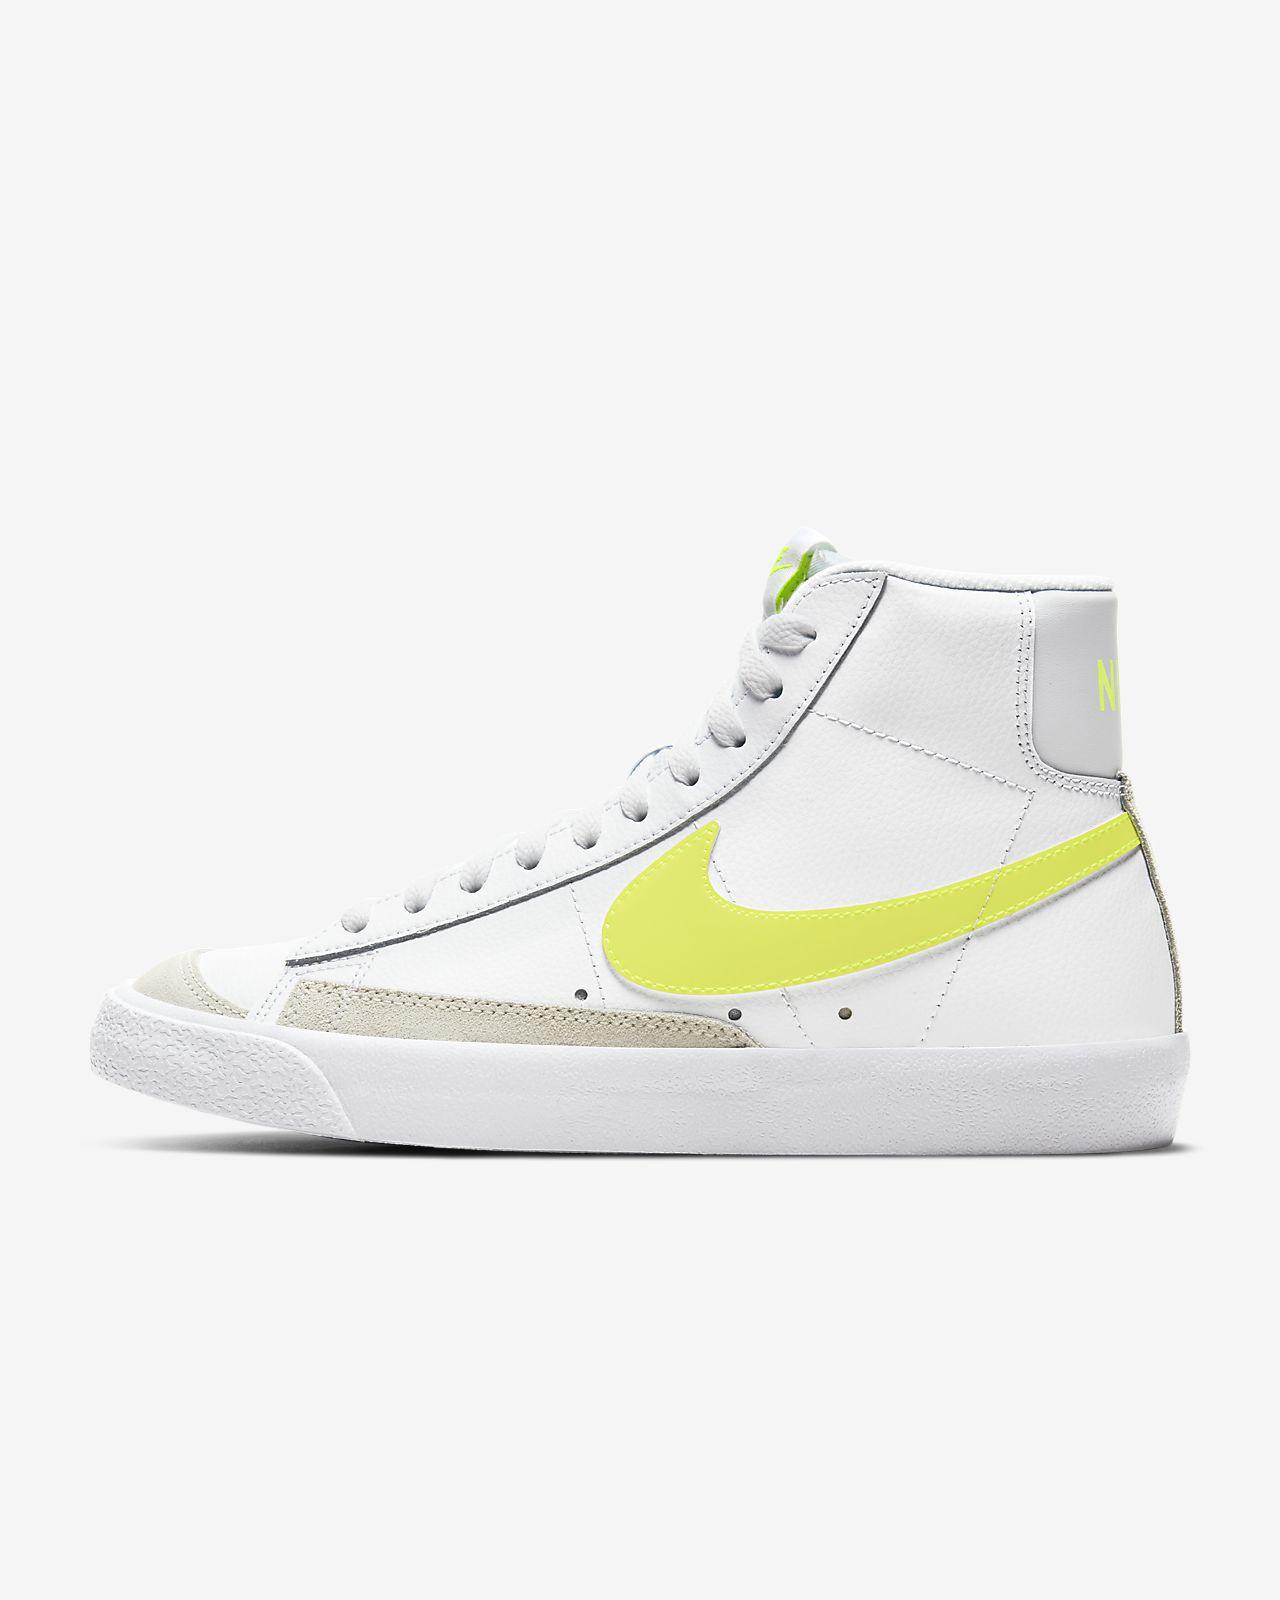 elige genuino cliente primero excepcional gama de estilos Nike Blazer Mid '77 Women's Shoe. Nike AE